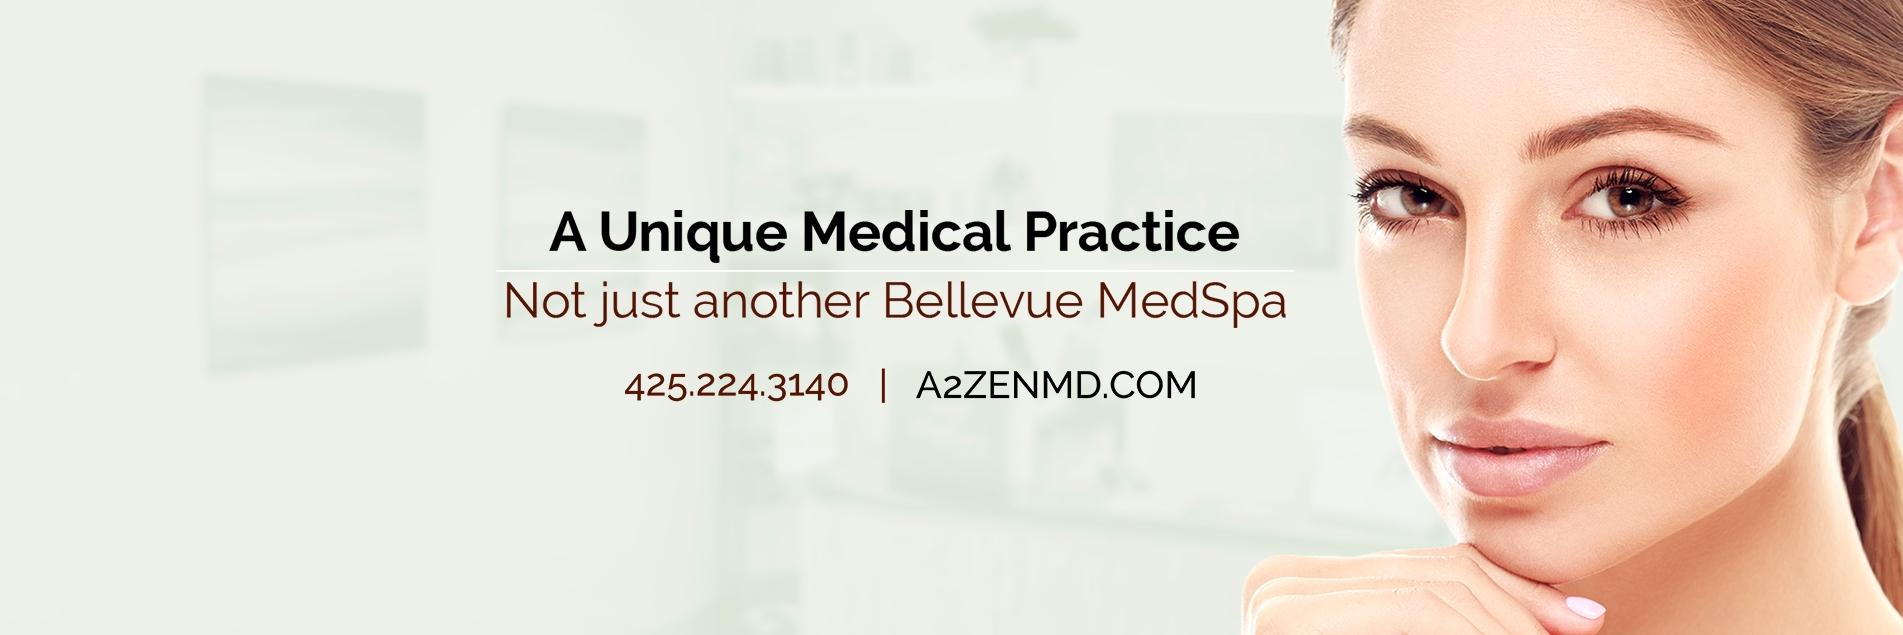 A-To-Zen Regenerative Medicine (@atozen) Cover Image